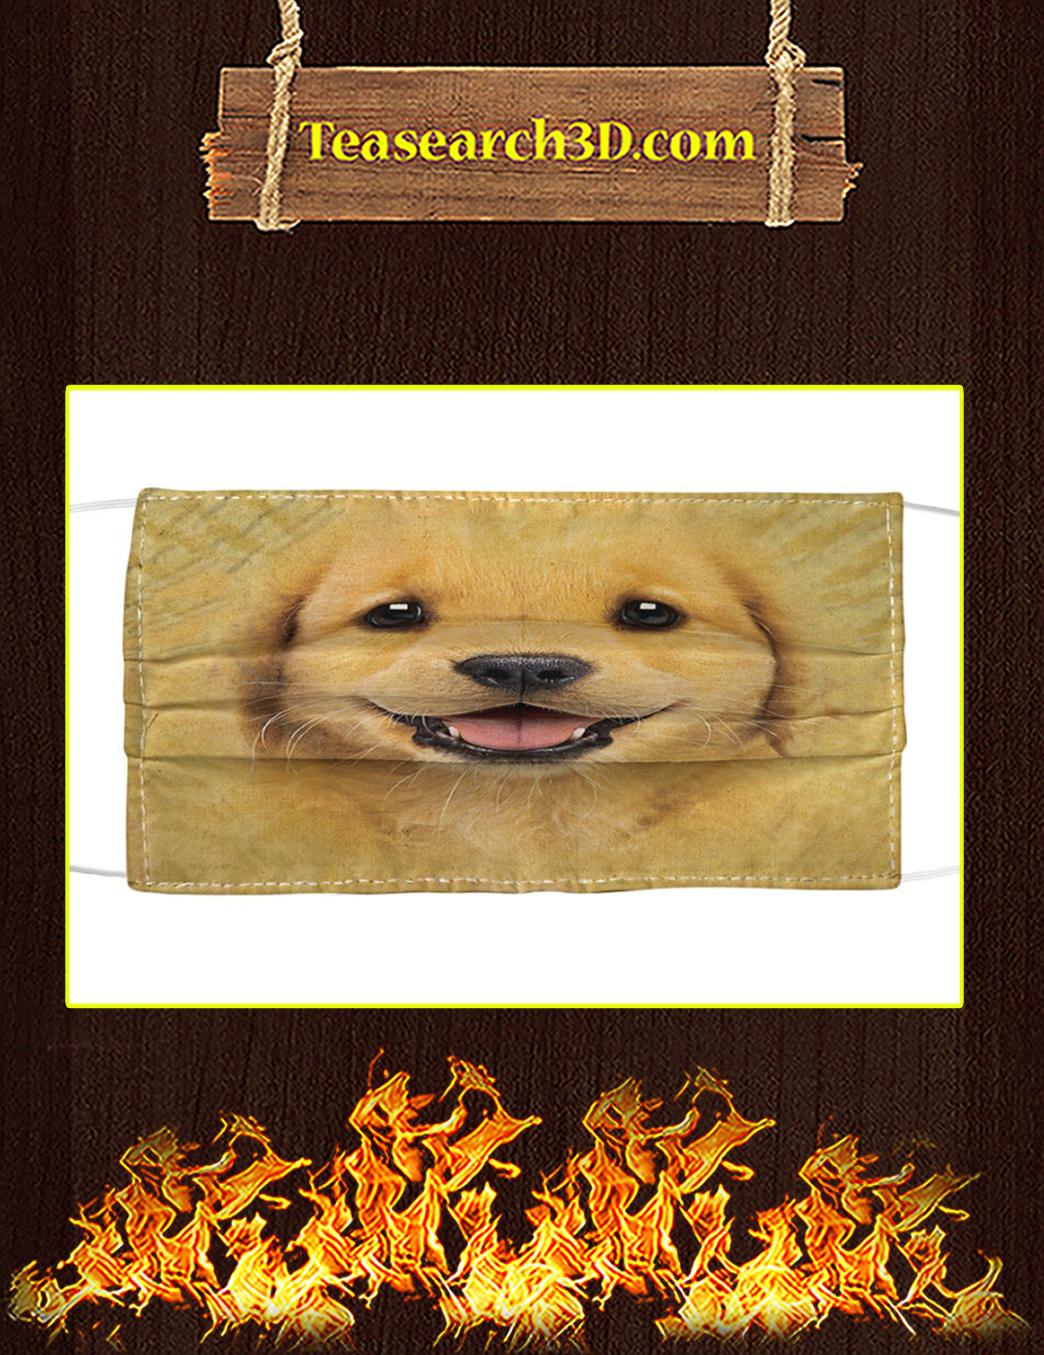 Golden Retriever Puppy Cloth Face Mask Pack 3